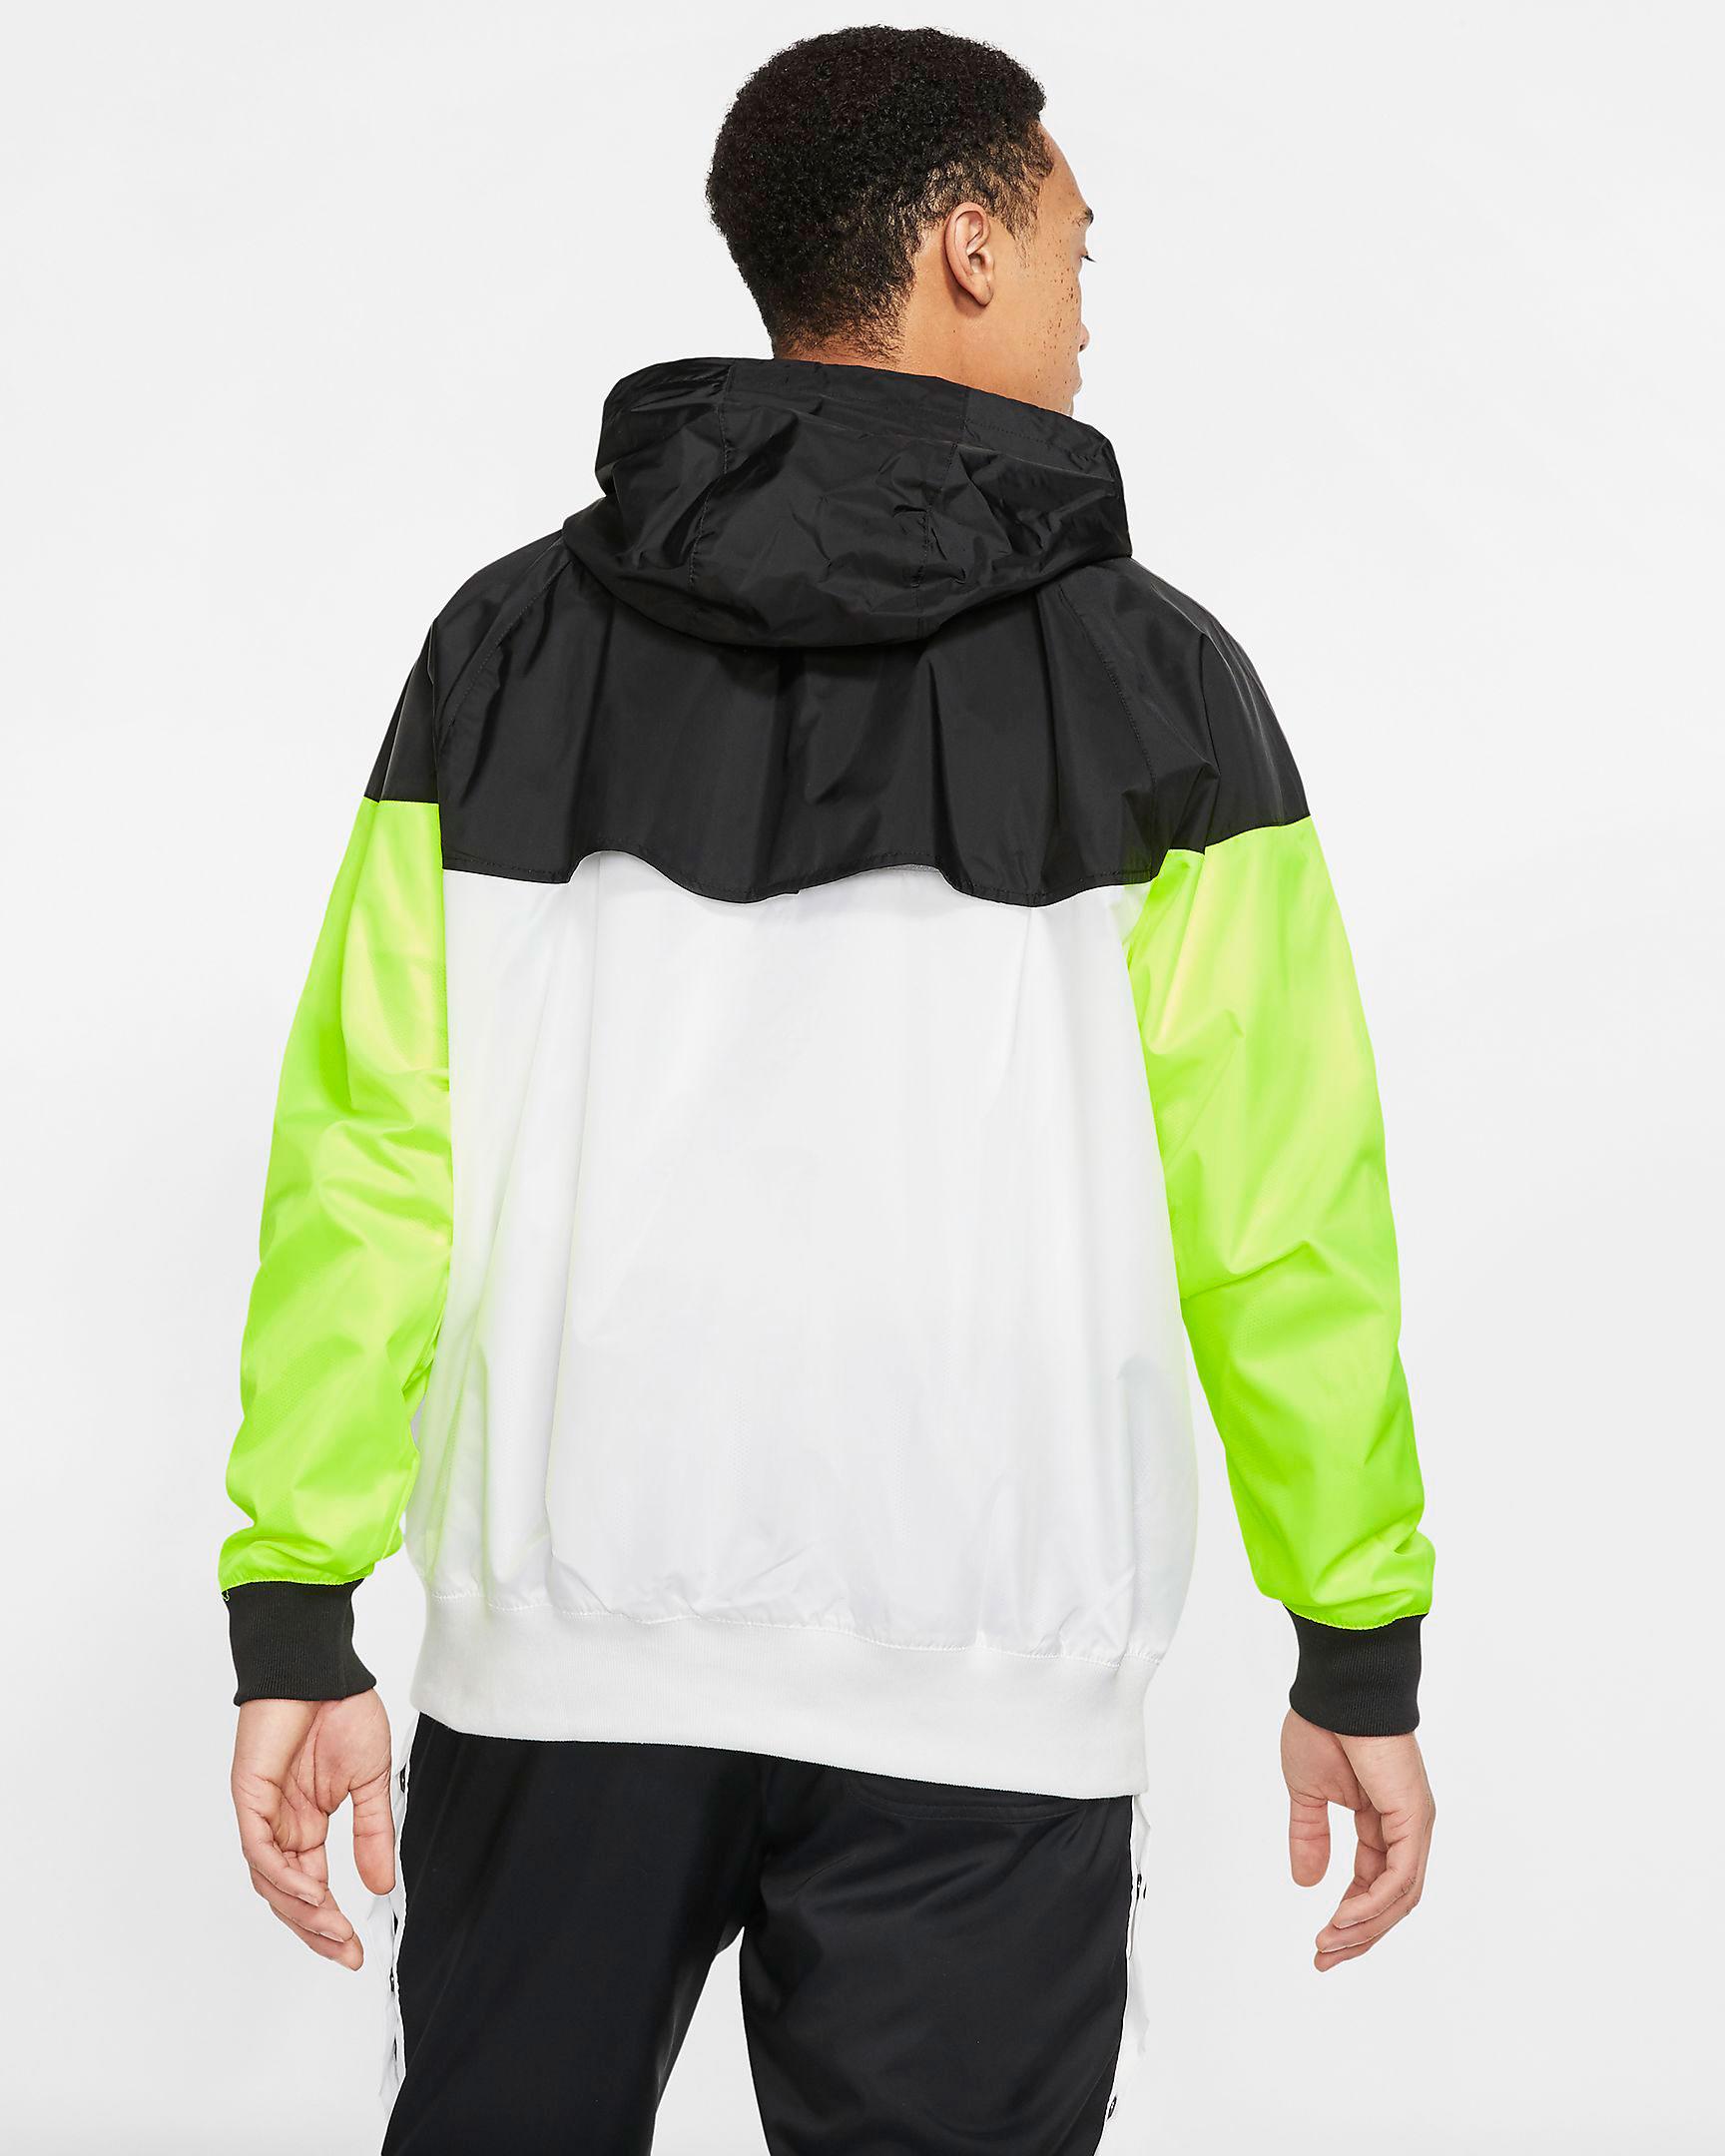 nike-kobe-5-protro-chaos-matching-jacket-2